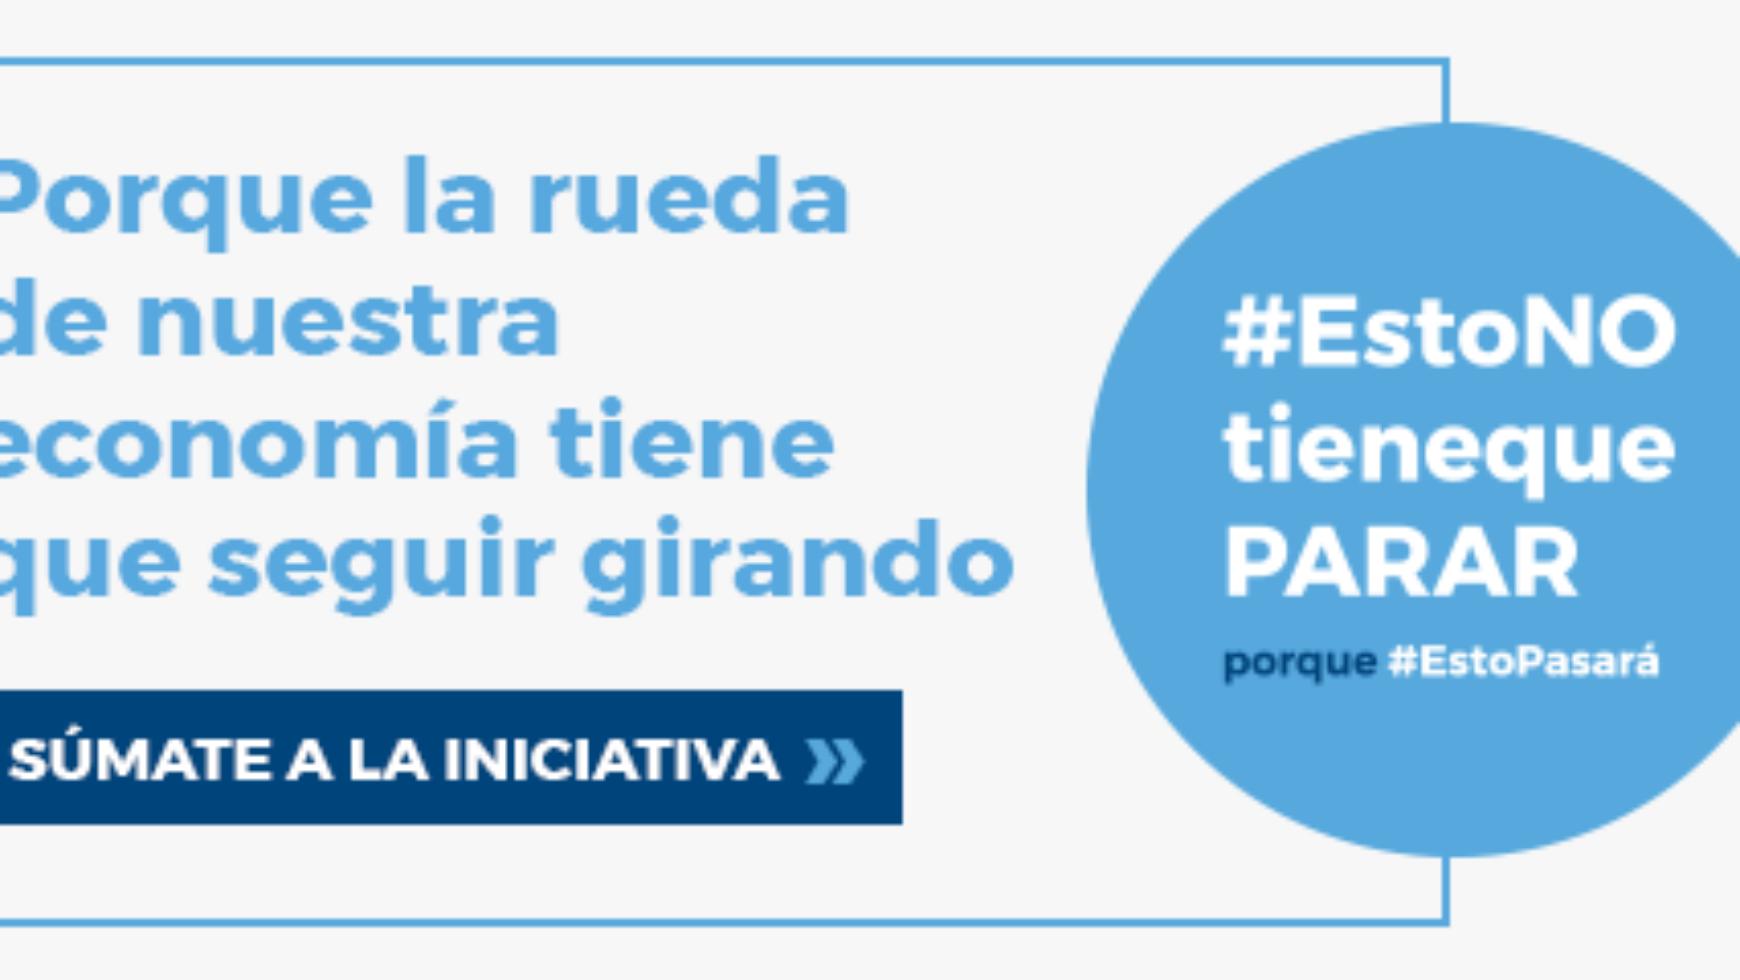 AEPA se suma al movimiento#EstoNOtienequePARAR